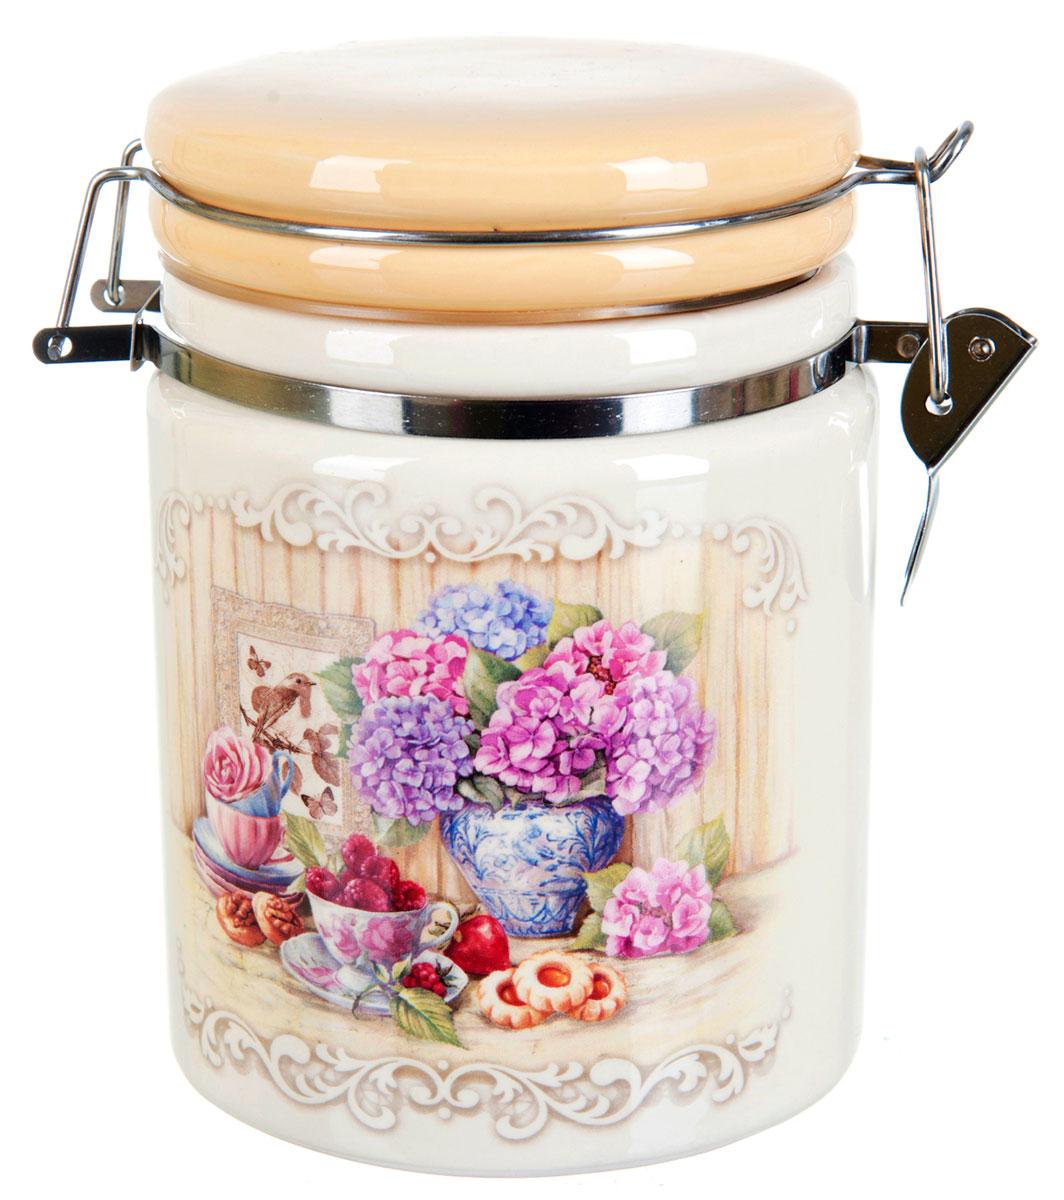 Банка для сыпучих продуктов Polystar Sweet Home, 850 мл банка для сыпучих продуктов polystar sweet home 850 мл